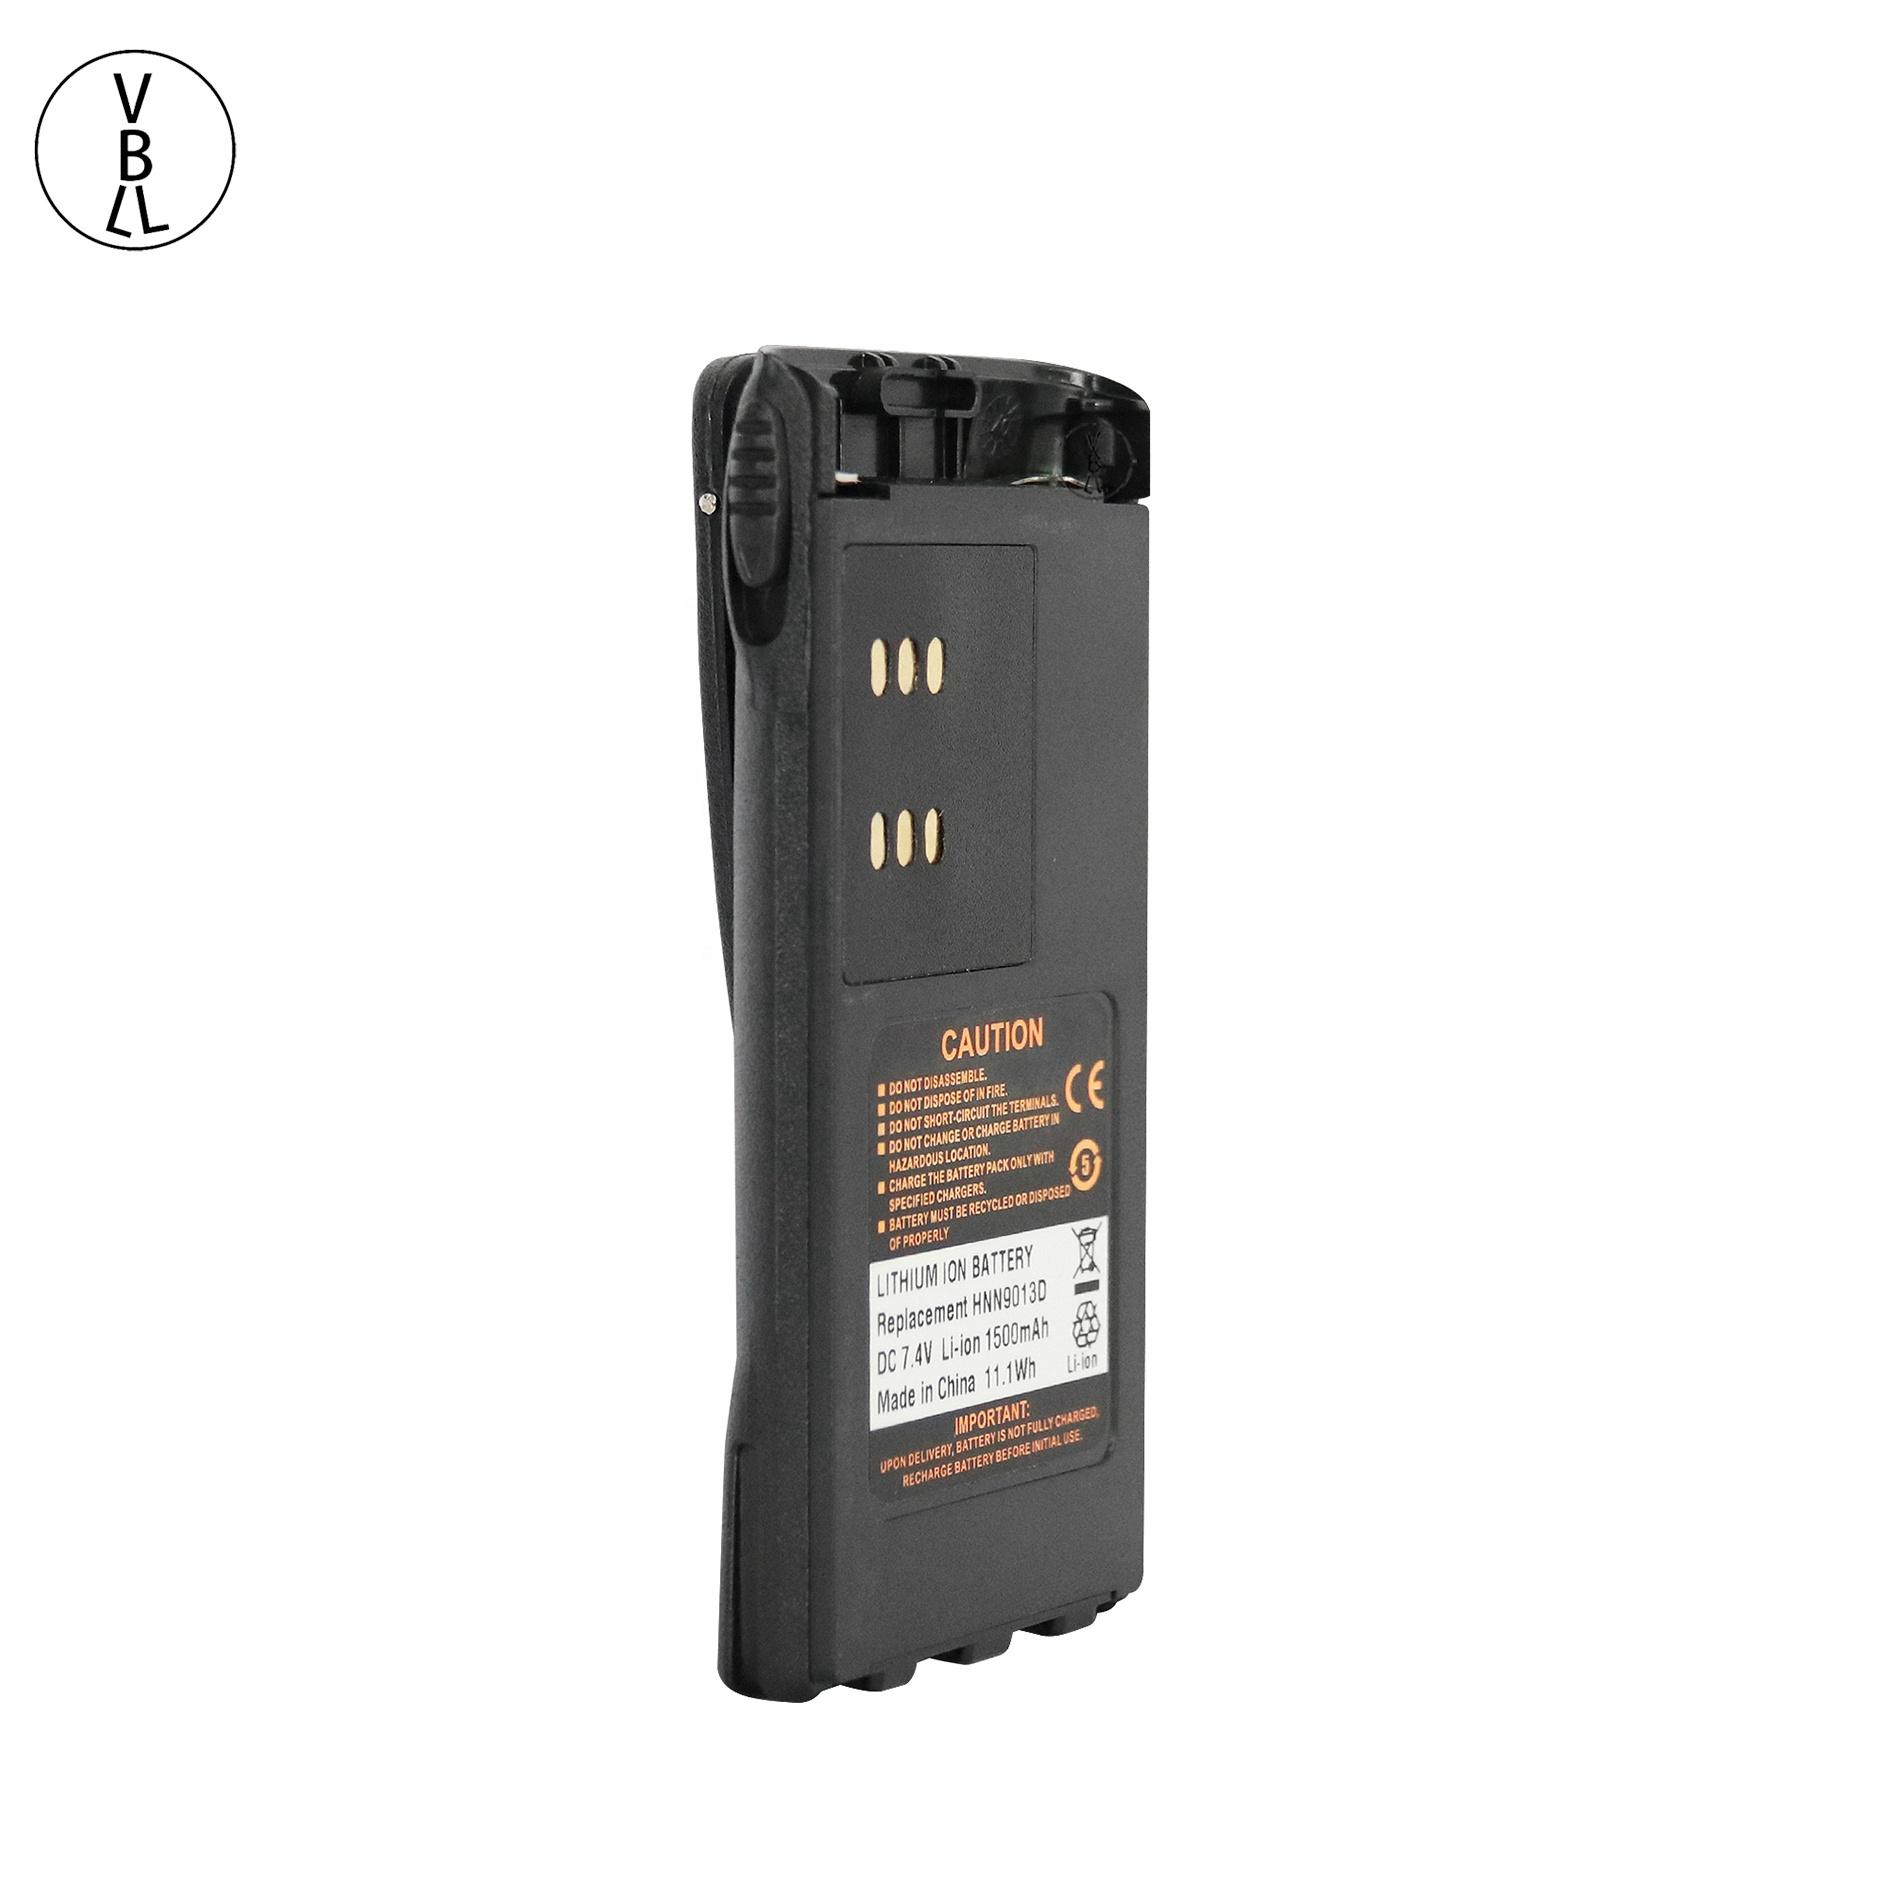 IP54 Compact Speaker Mic for Motorola PR860 HT750 HT1550 PRO7150 PRO9150 HT1250